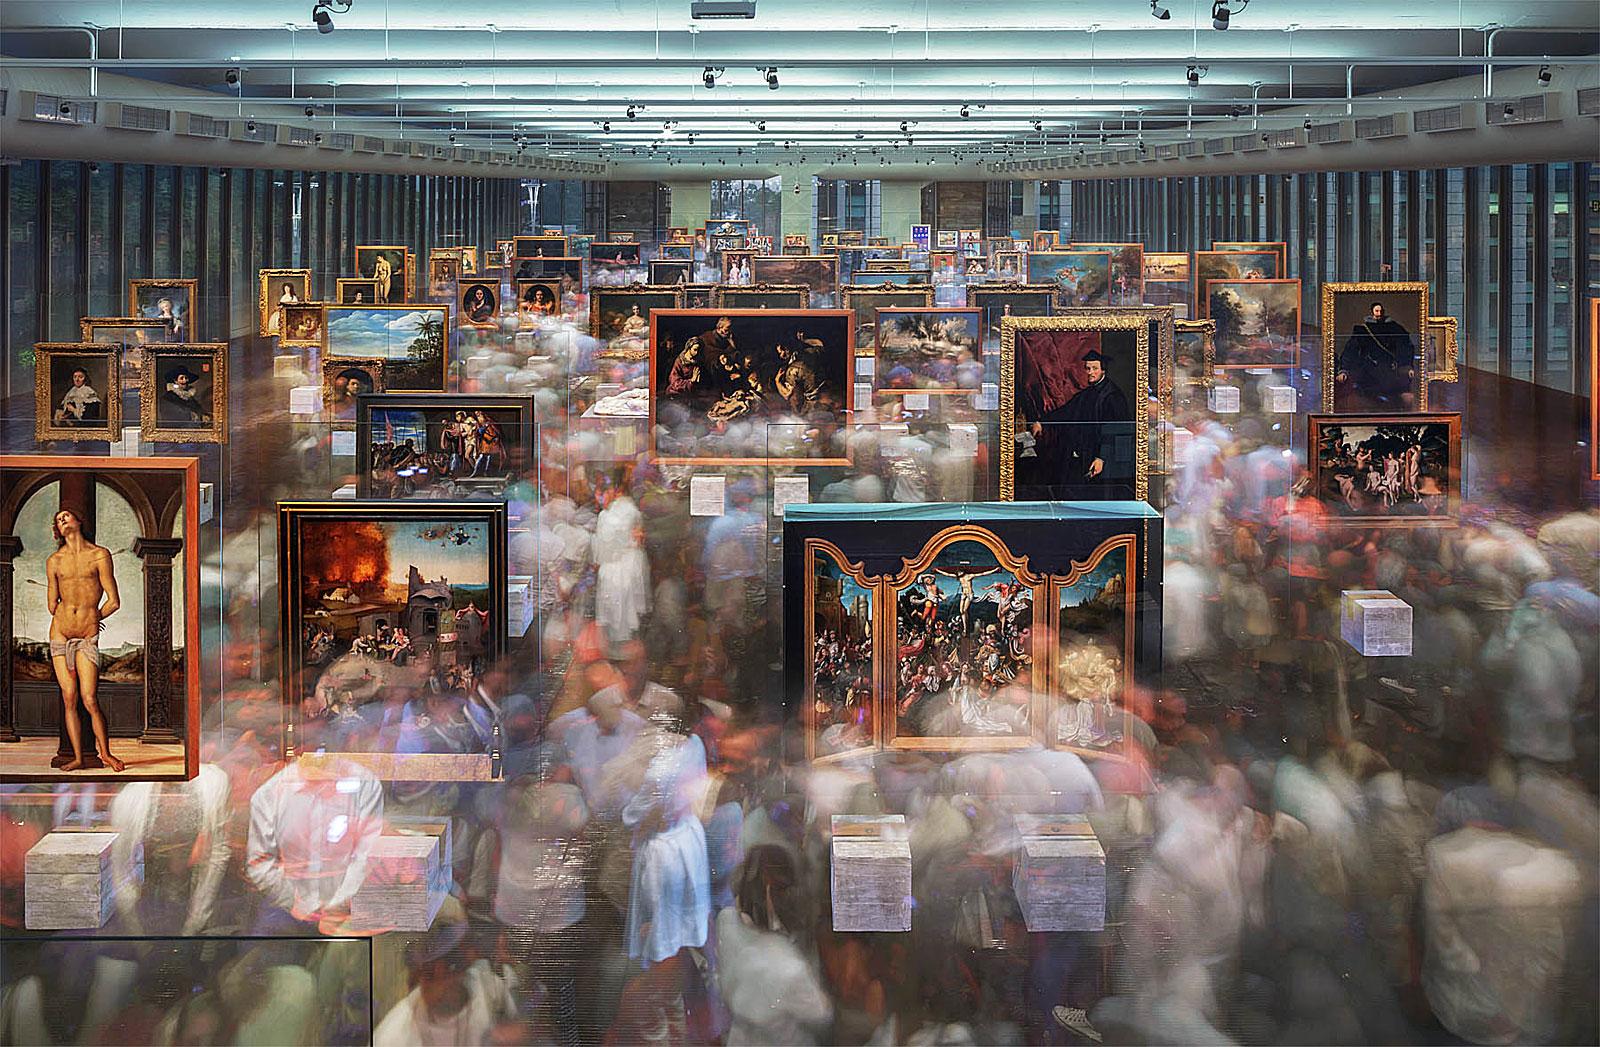 Abertura, Pinacoteca MASP (19.01 - 23.09 Uhr 10.12.2015)